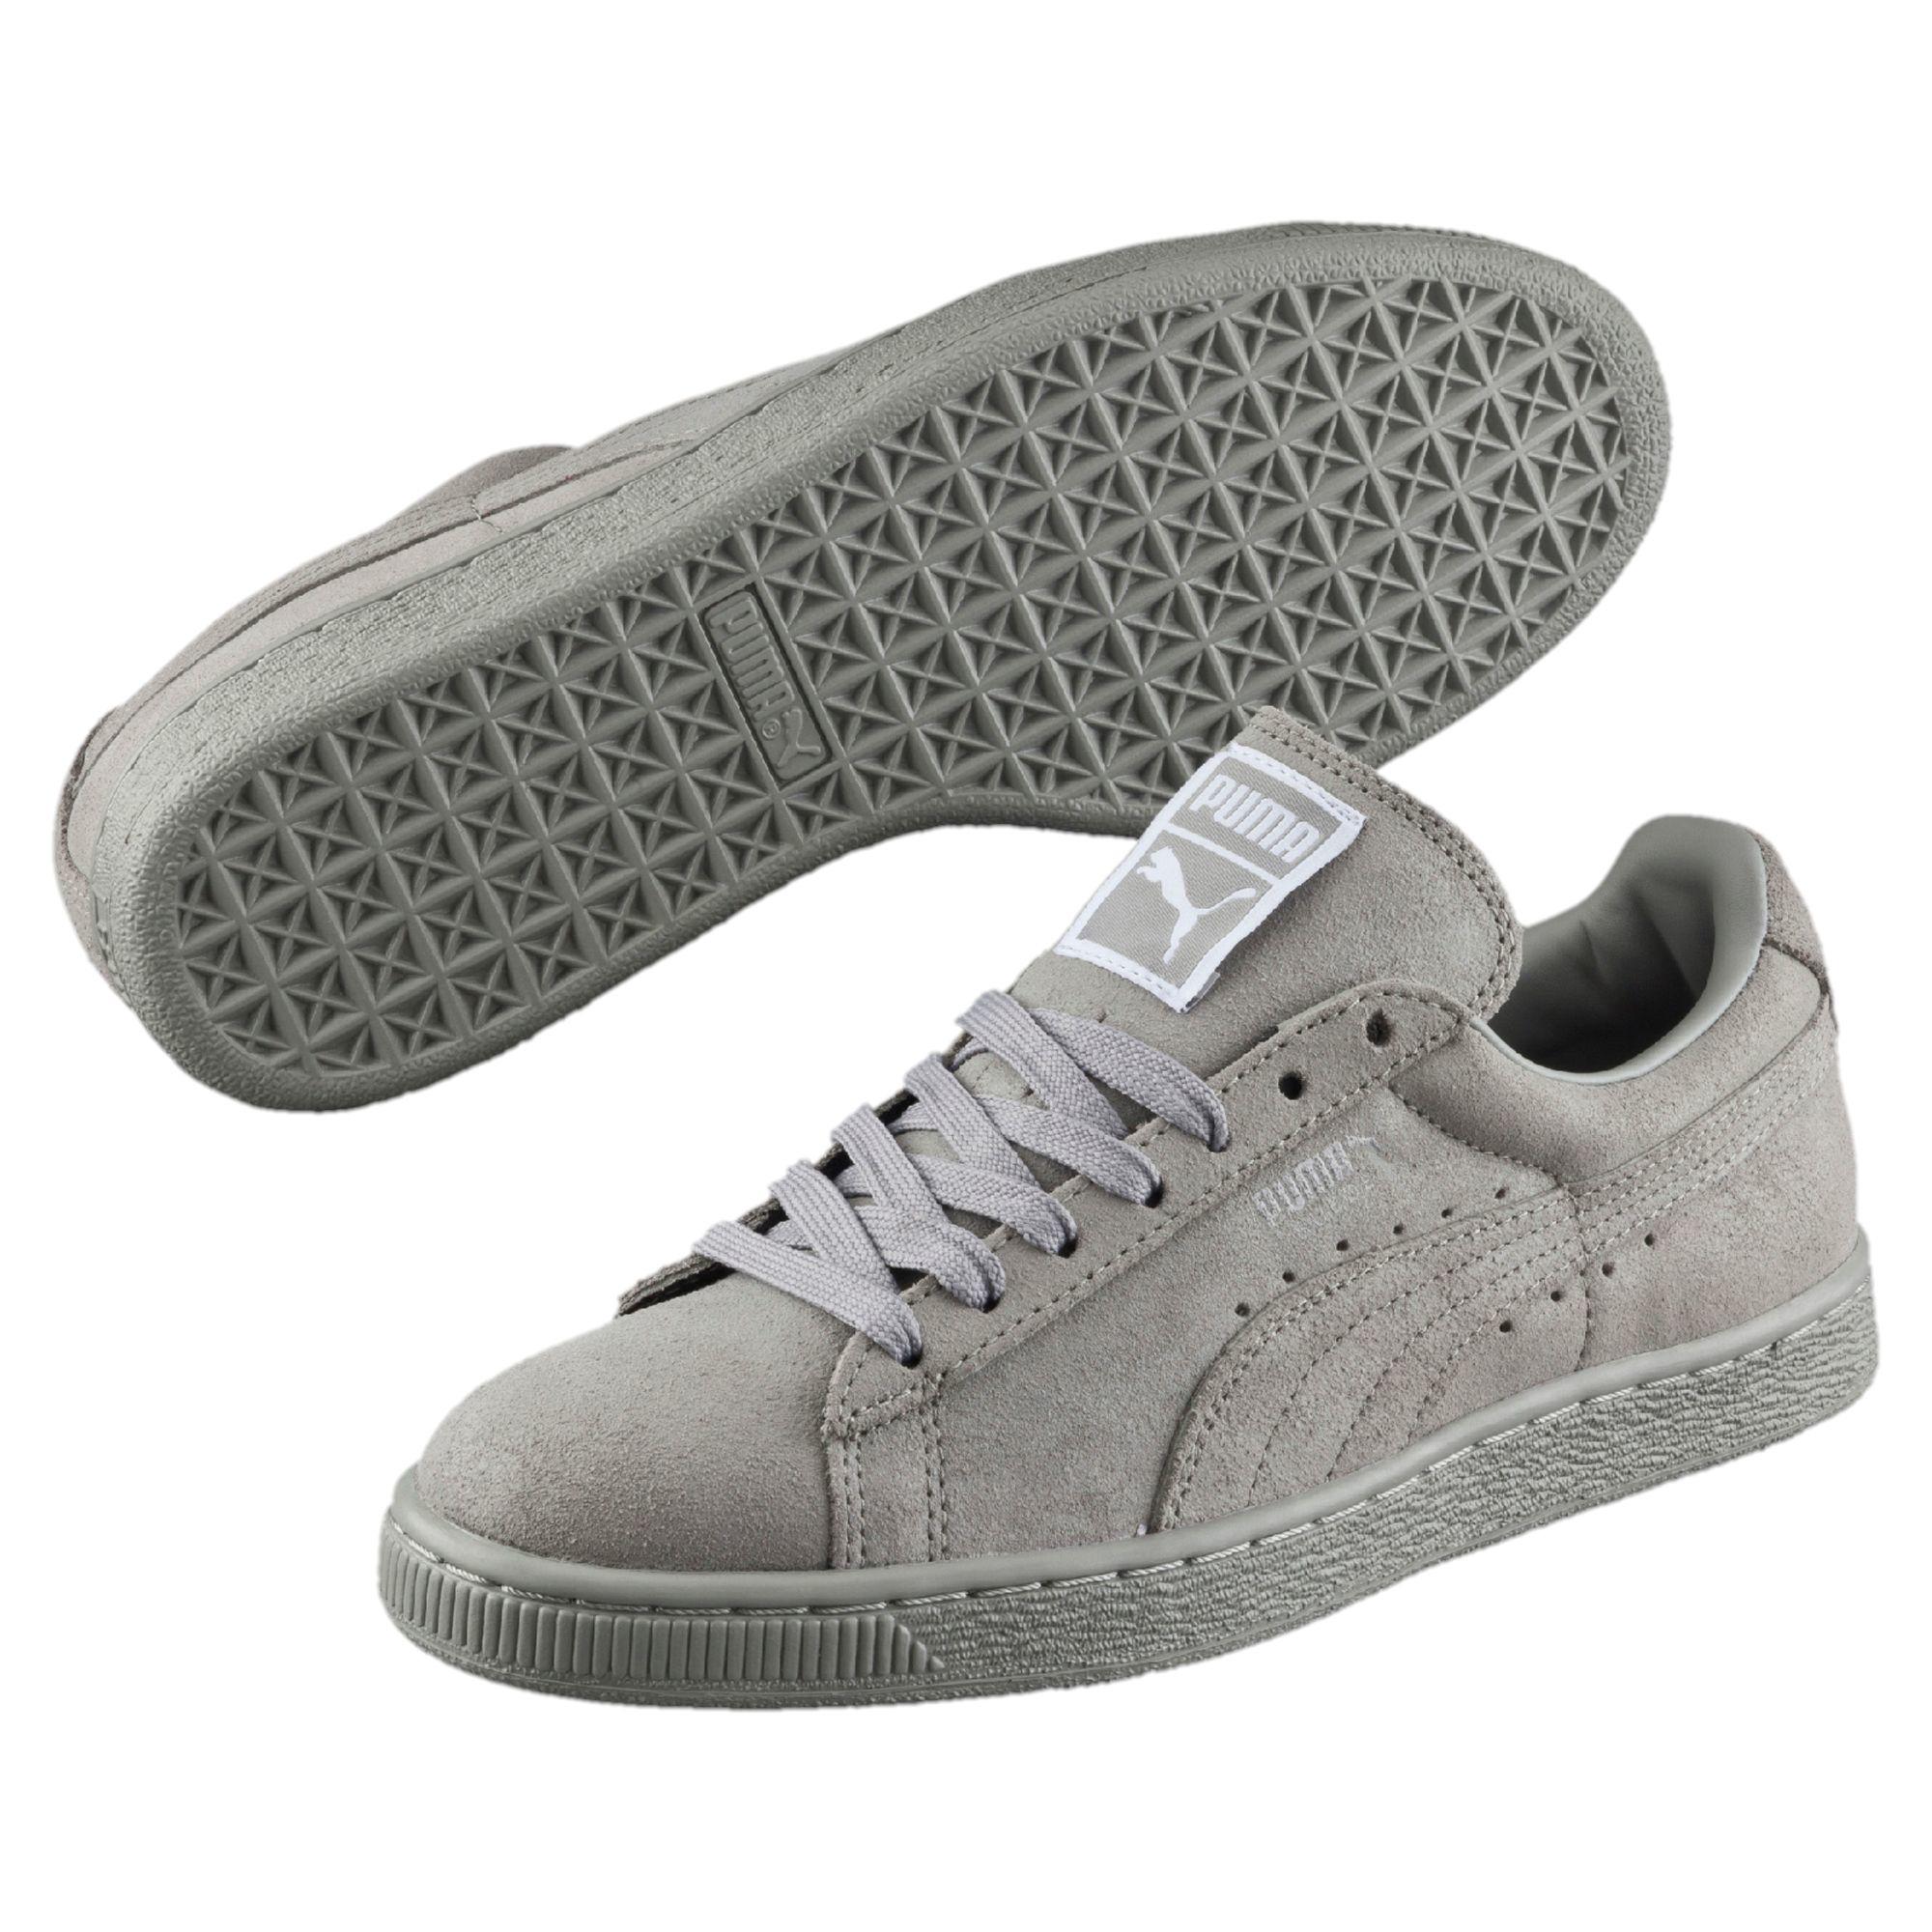 8cec23de7bdd Lyst - Puma Suede Classic Matte   Shine Women s Sneakers in Gray